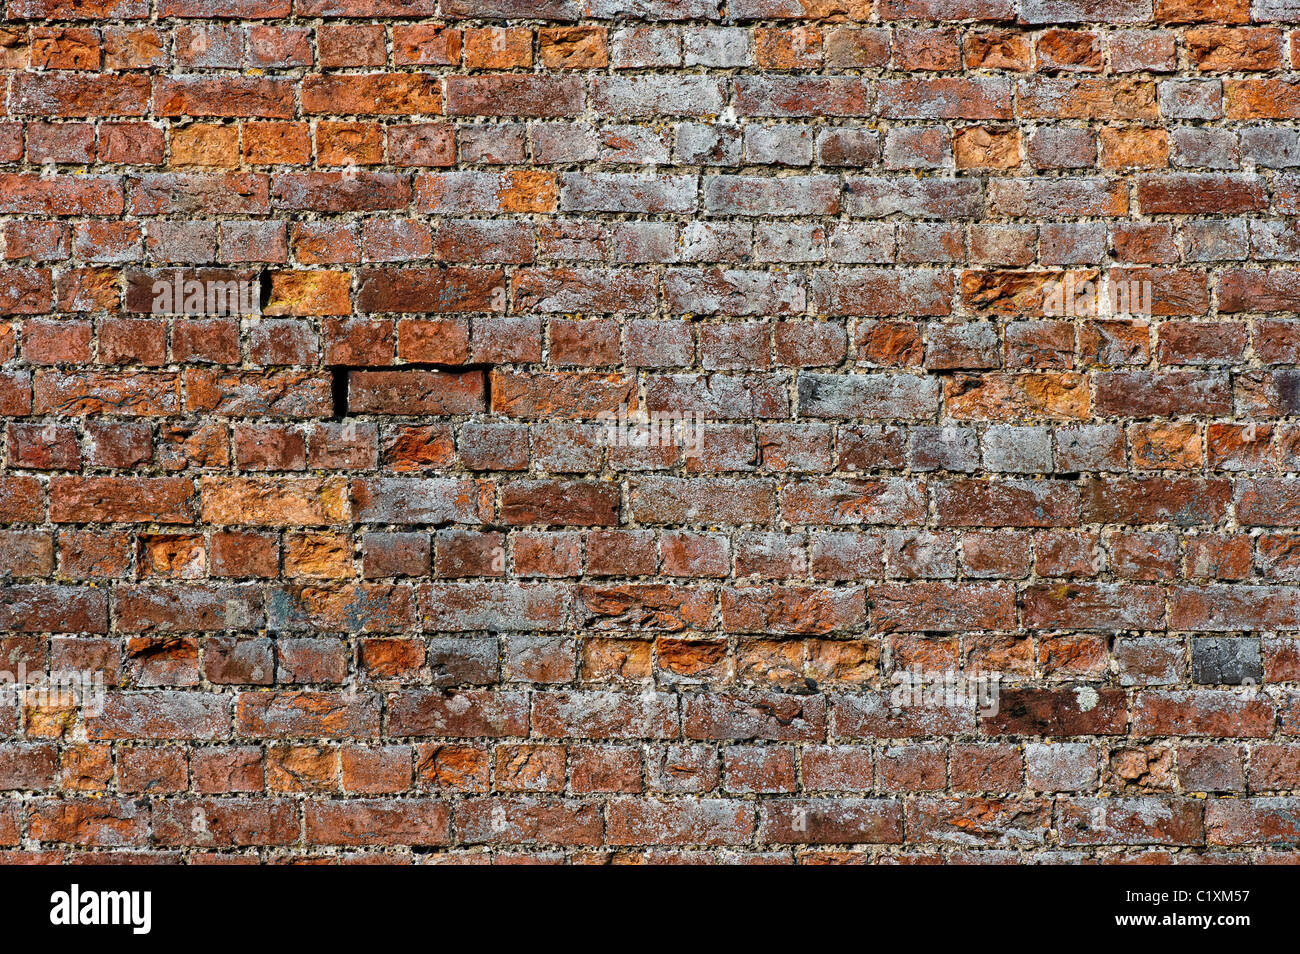 Old garden brick wall - Stock Image